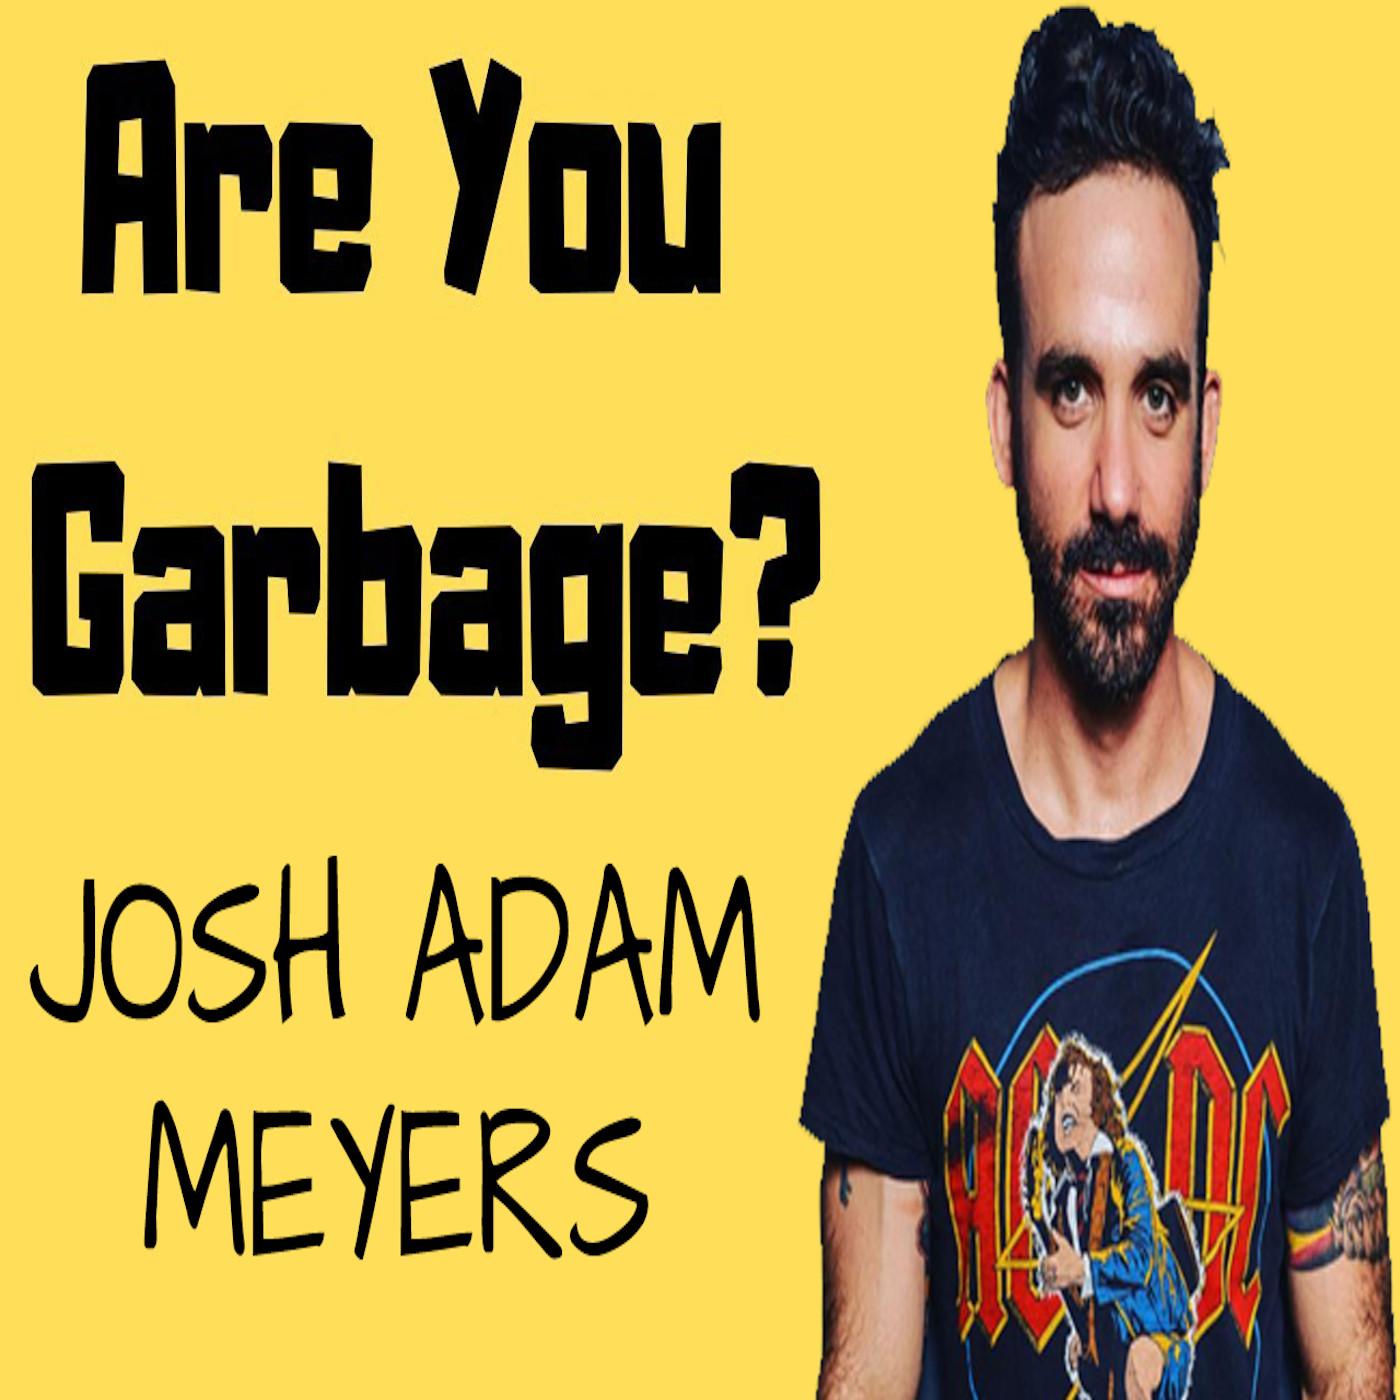 Josh Adam Meyers: Hollywood Trash